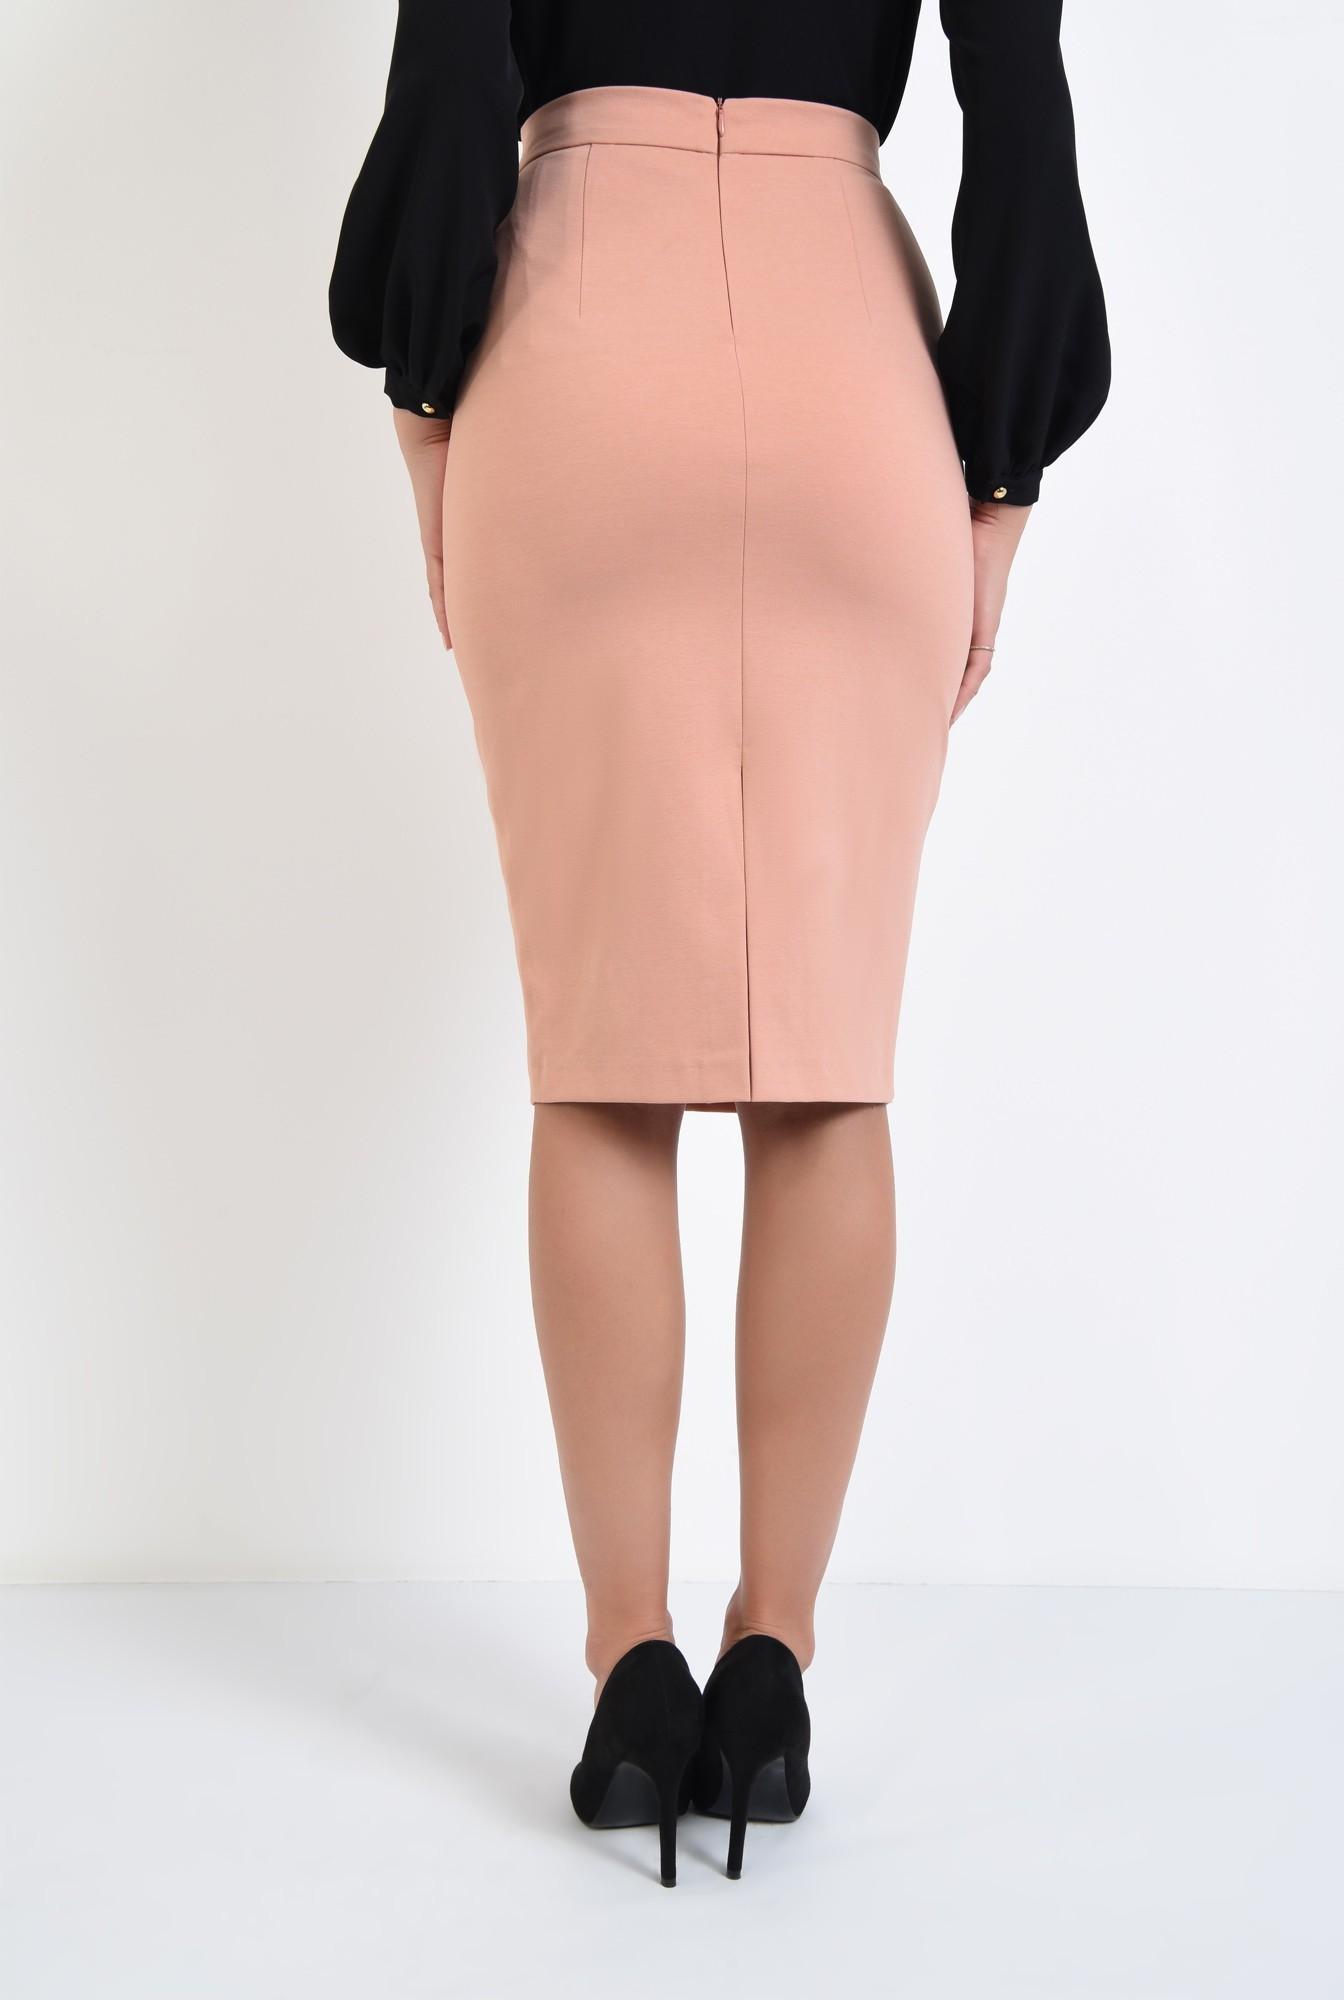 1 - fusta casual, roz piersica, croi conic, talie inalta